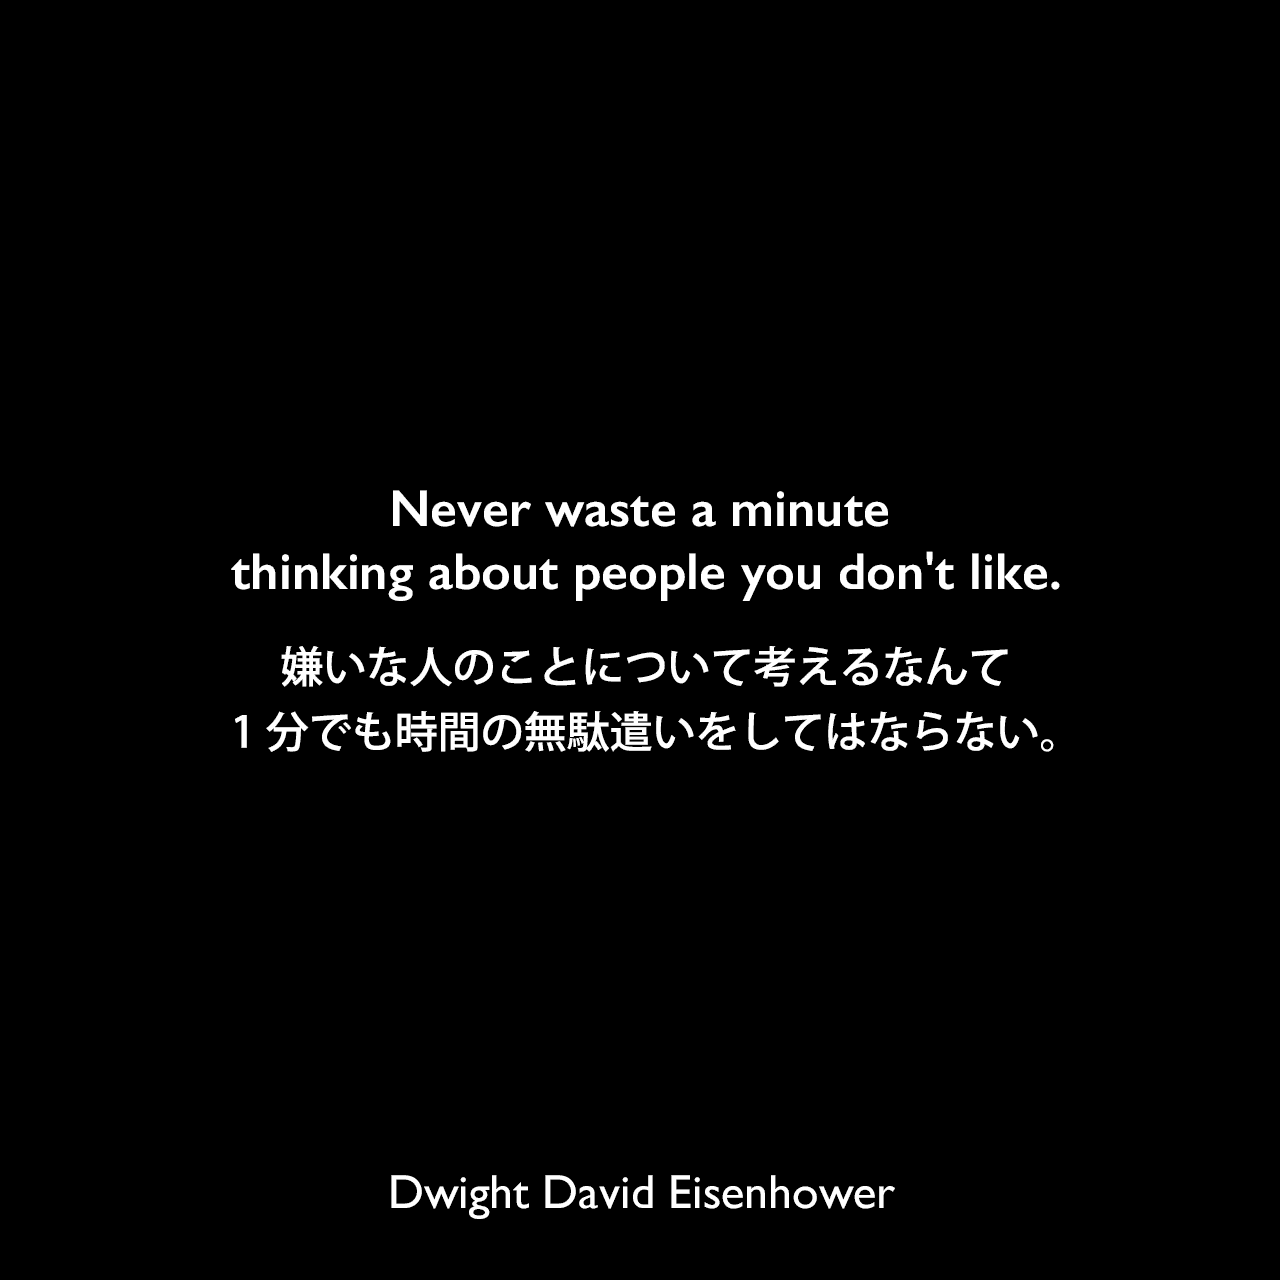 Never waste a minute thinking about people you don't like.嫌いな人のことについて考えるなんて1分でも時間の無駄遣いをしてはならない。Dwight David Eisenhower